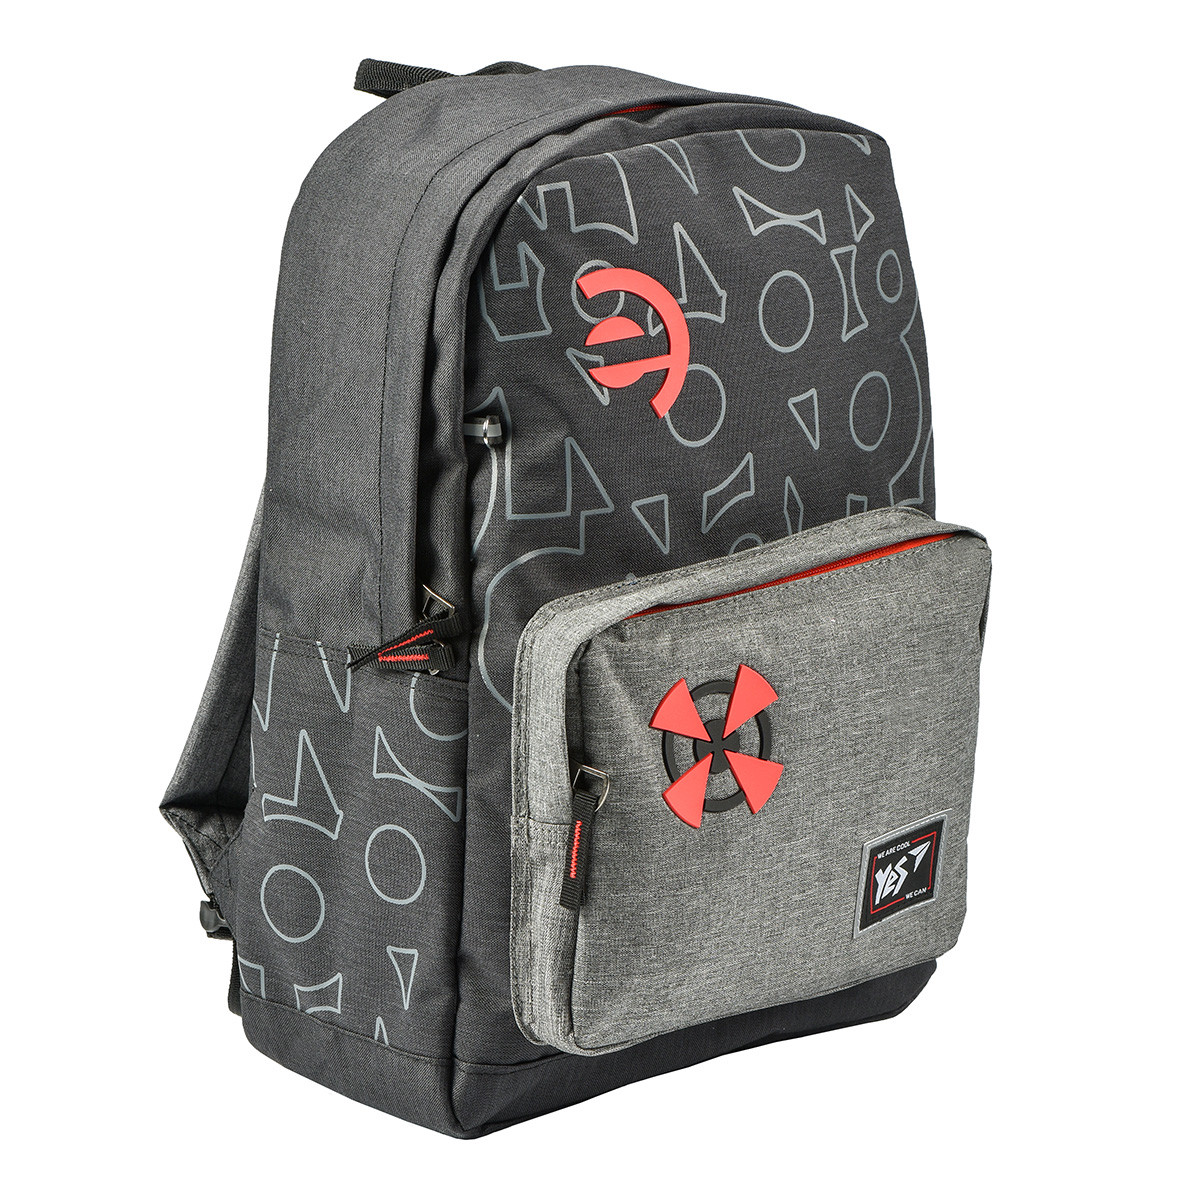 Рюкзак молодежный YES T-67 Vice versa код: 558281